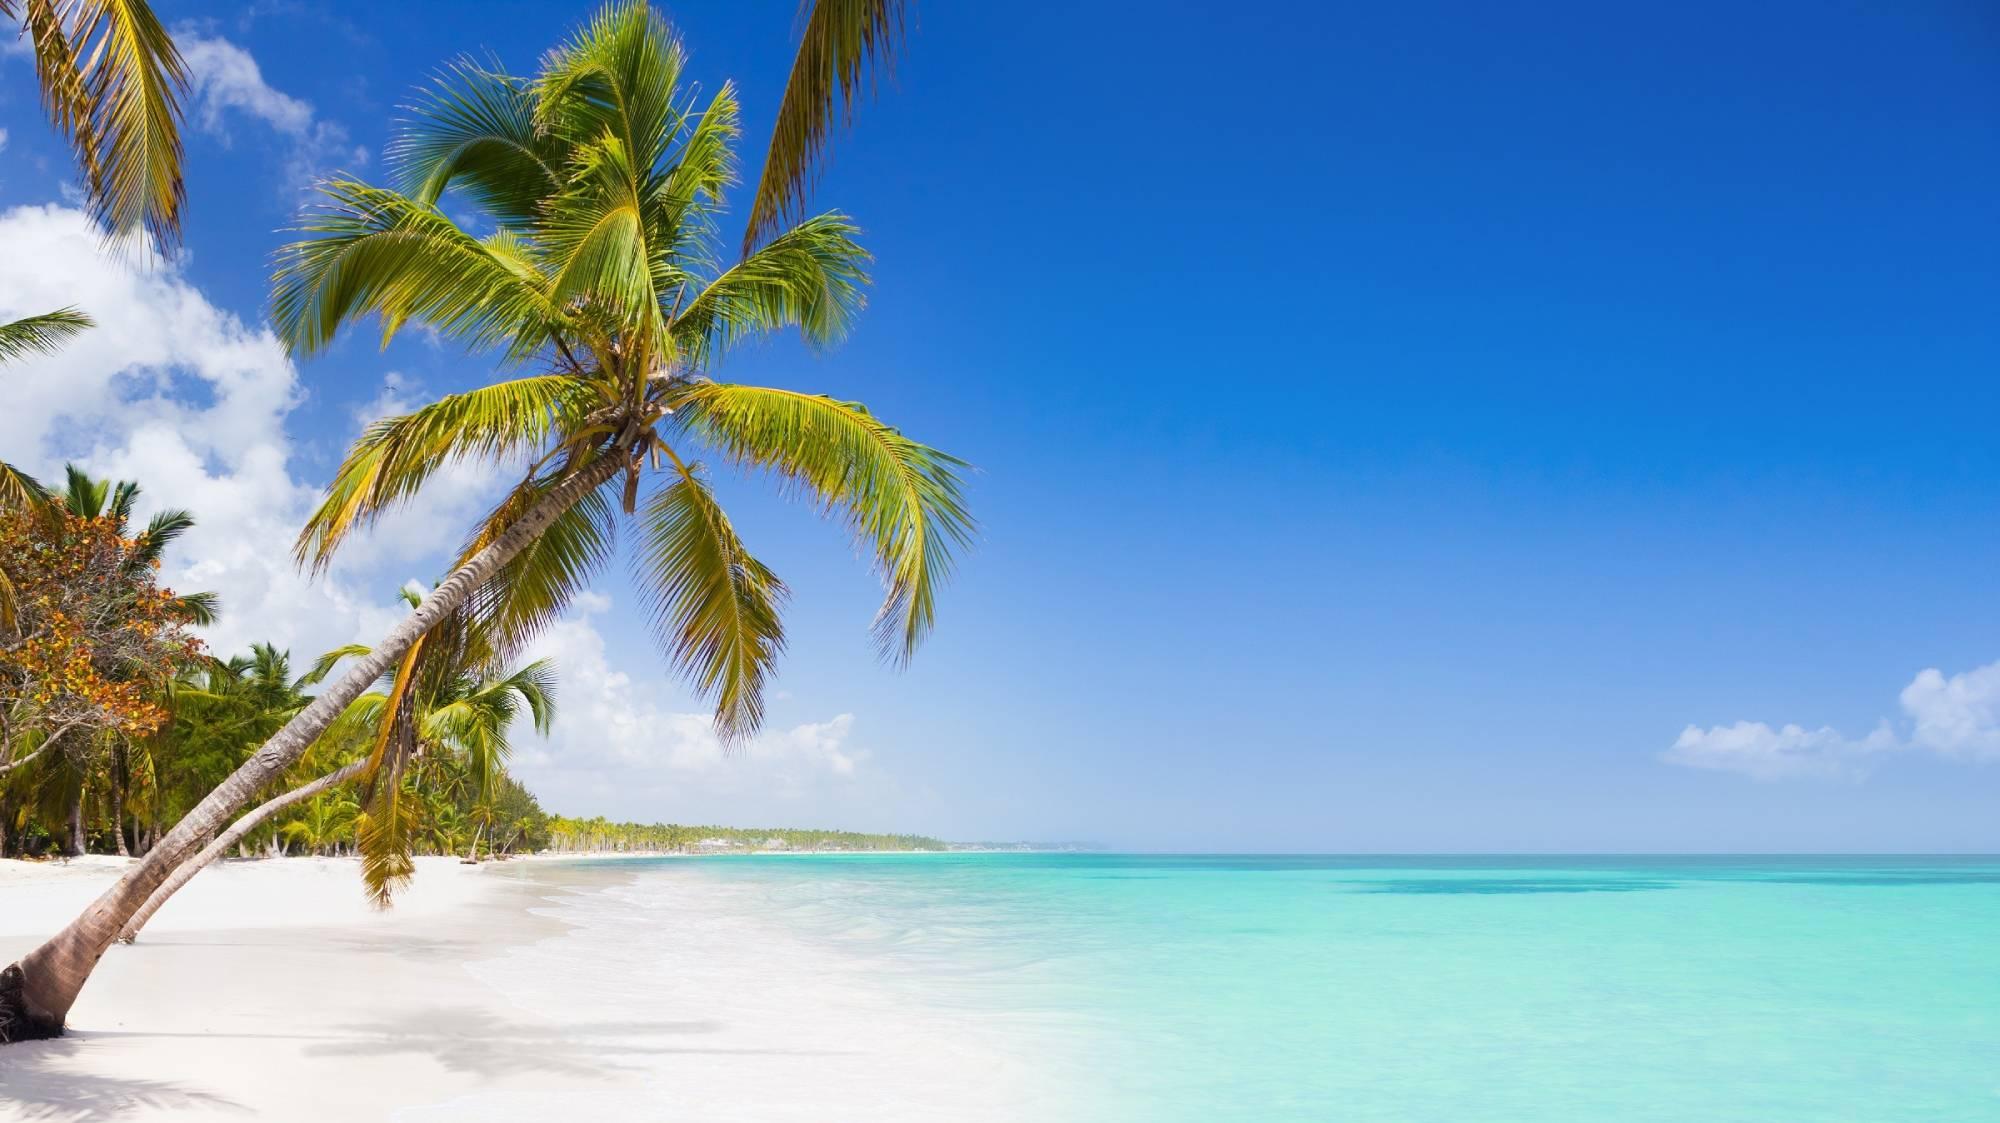 Punta Cana - Travel Blog